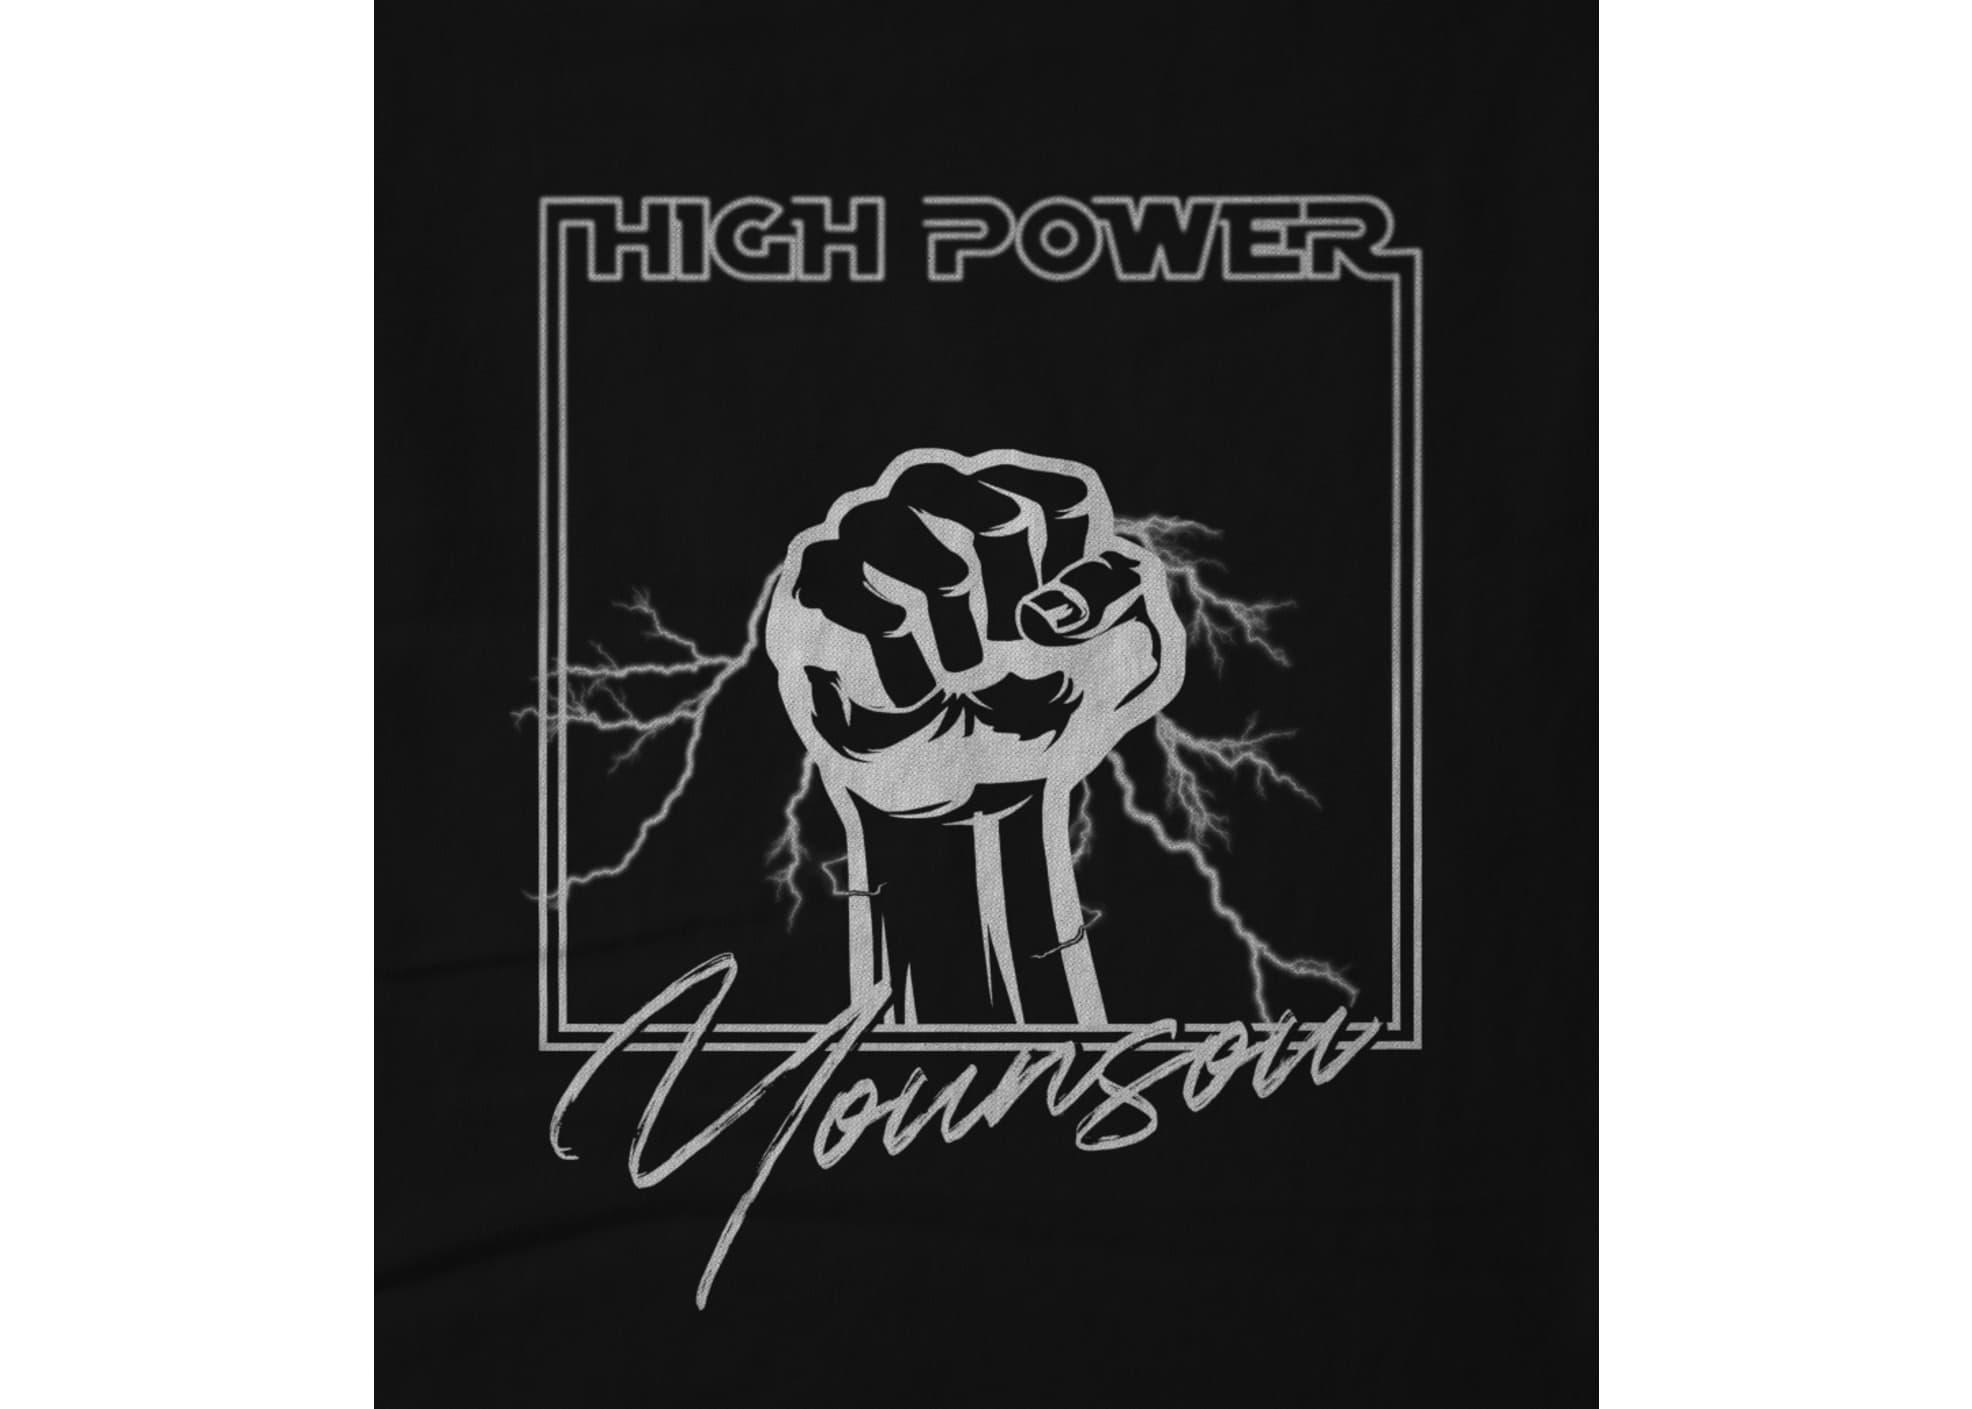 Younsou high power white on black 1625547700